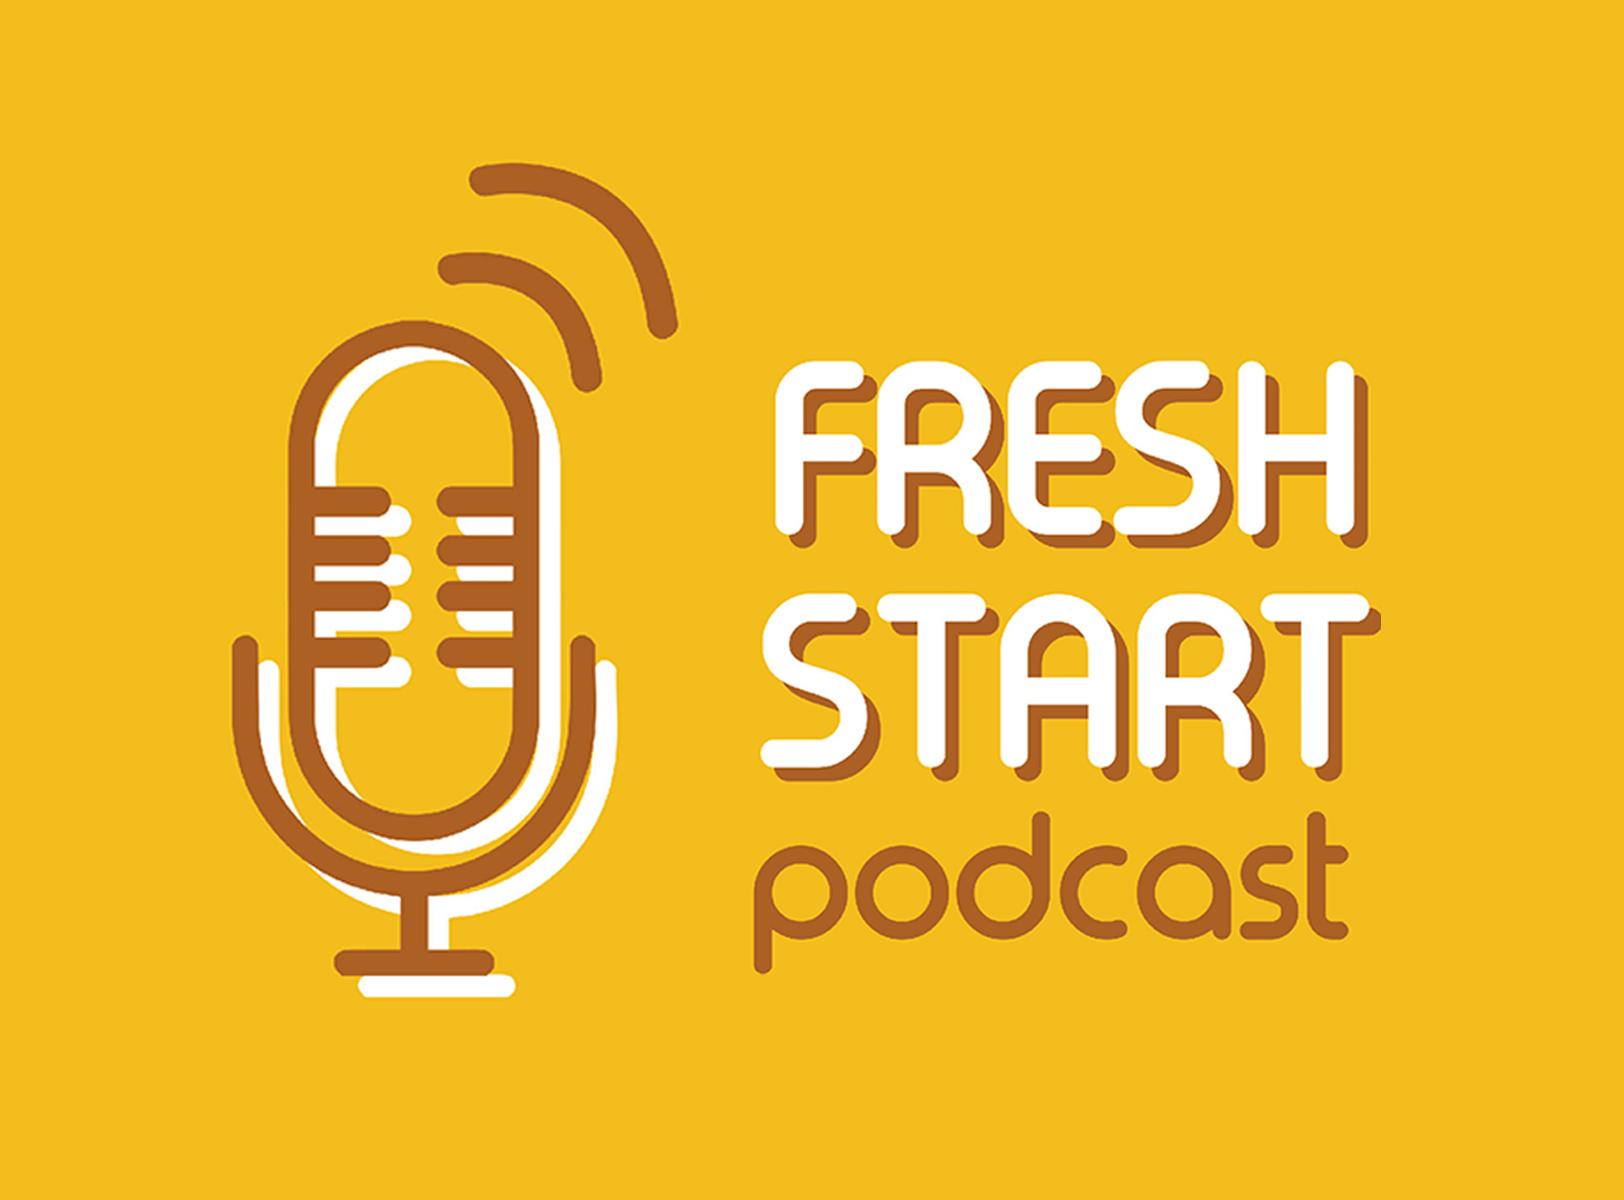 Fresh Start: Podcast News (3/27/2019 Wed.)